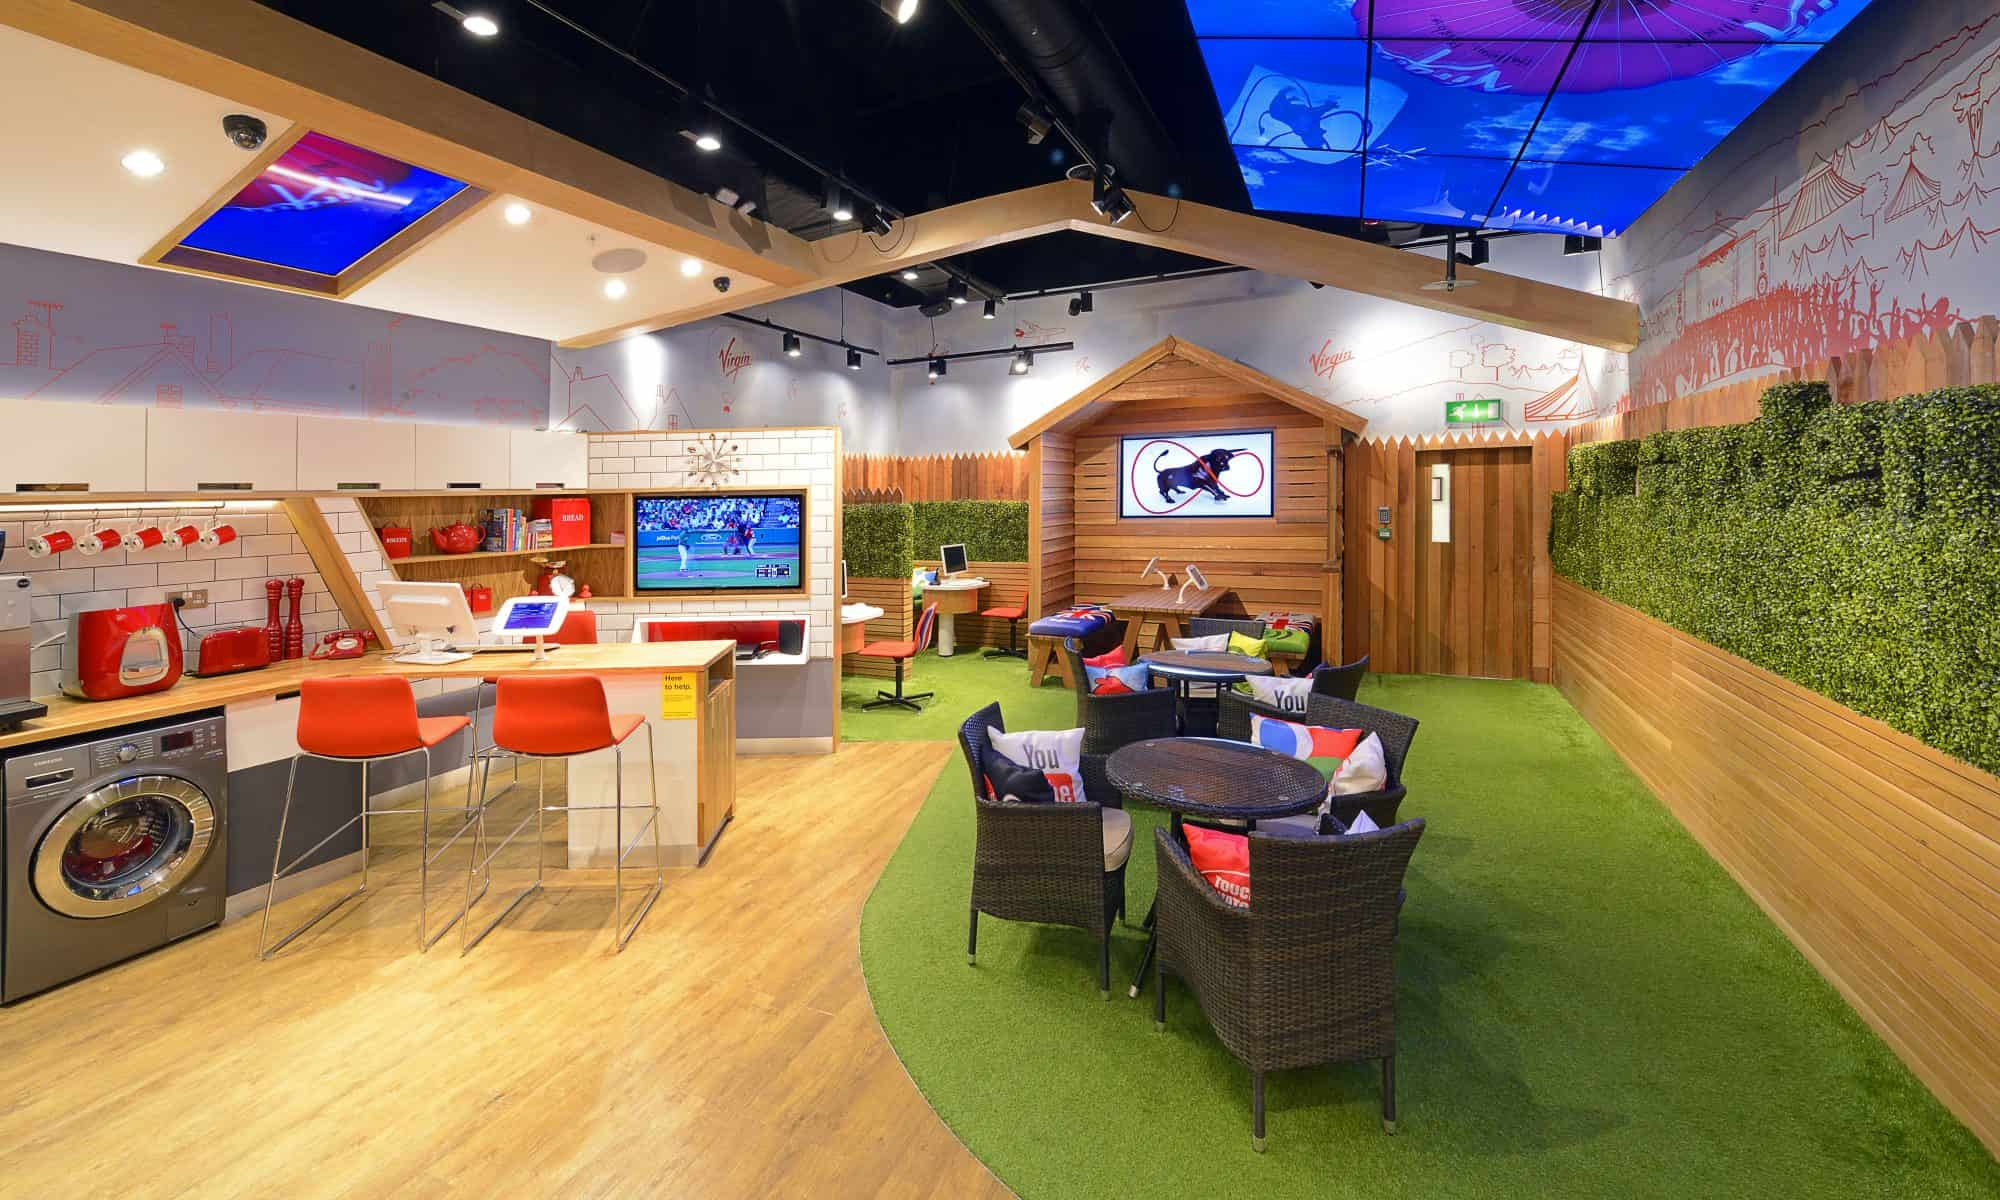 Virgin Media Store Birmingham